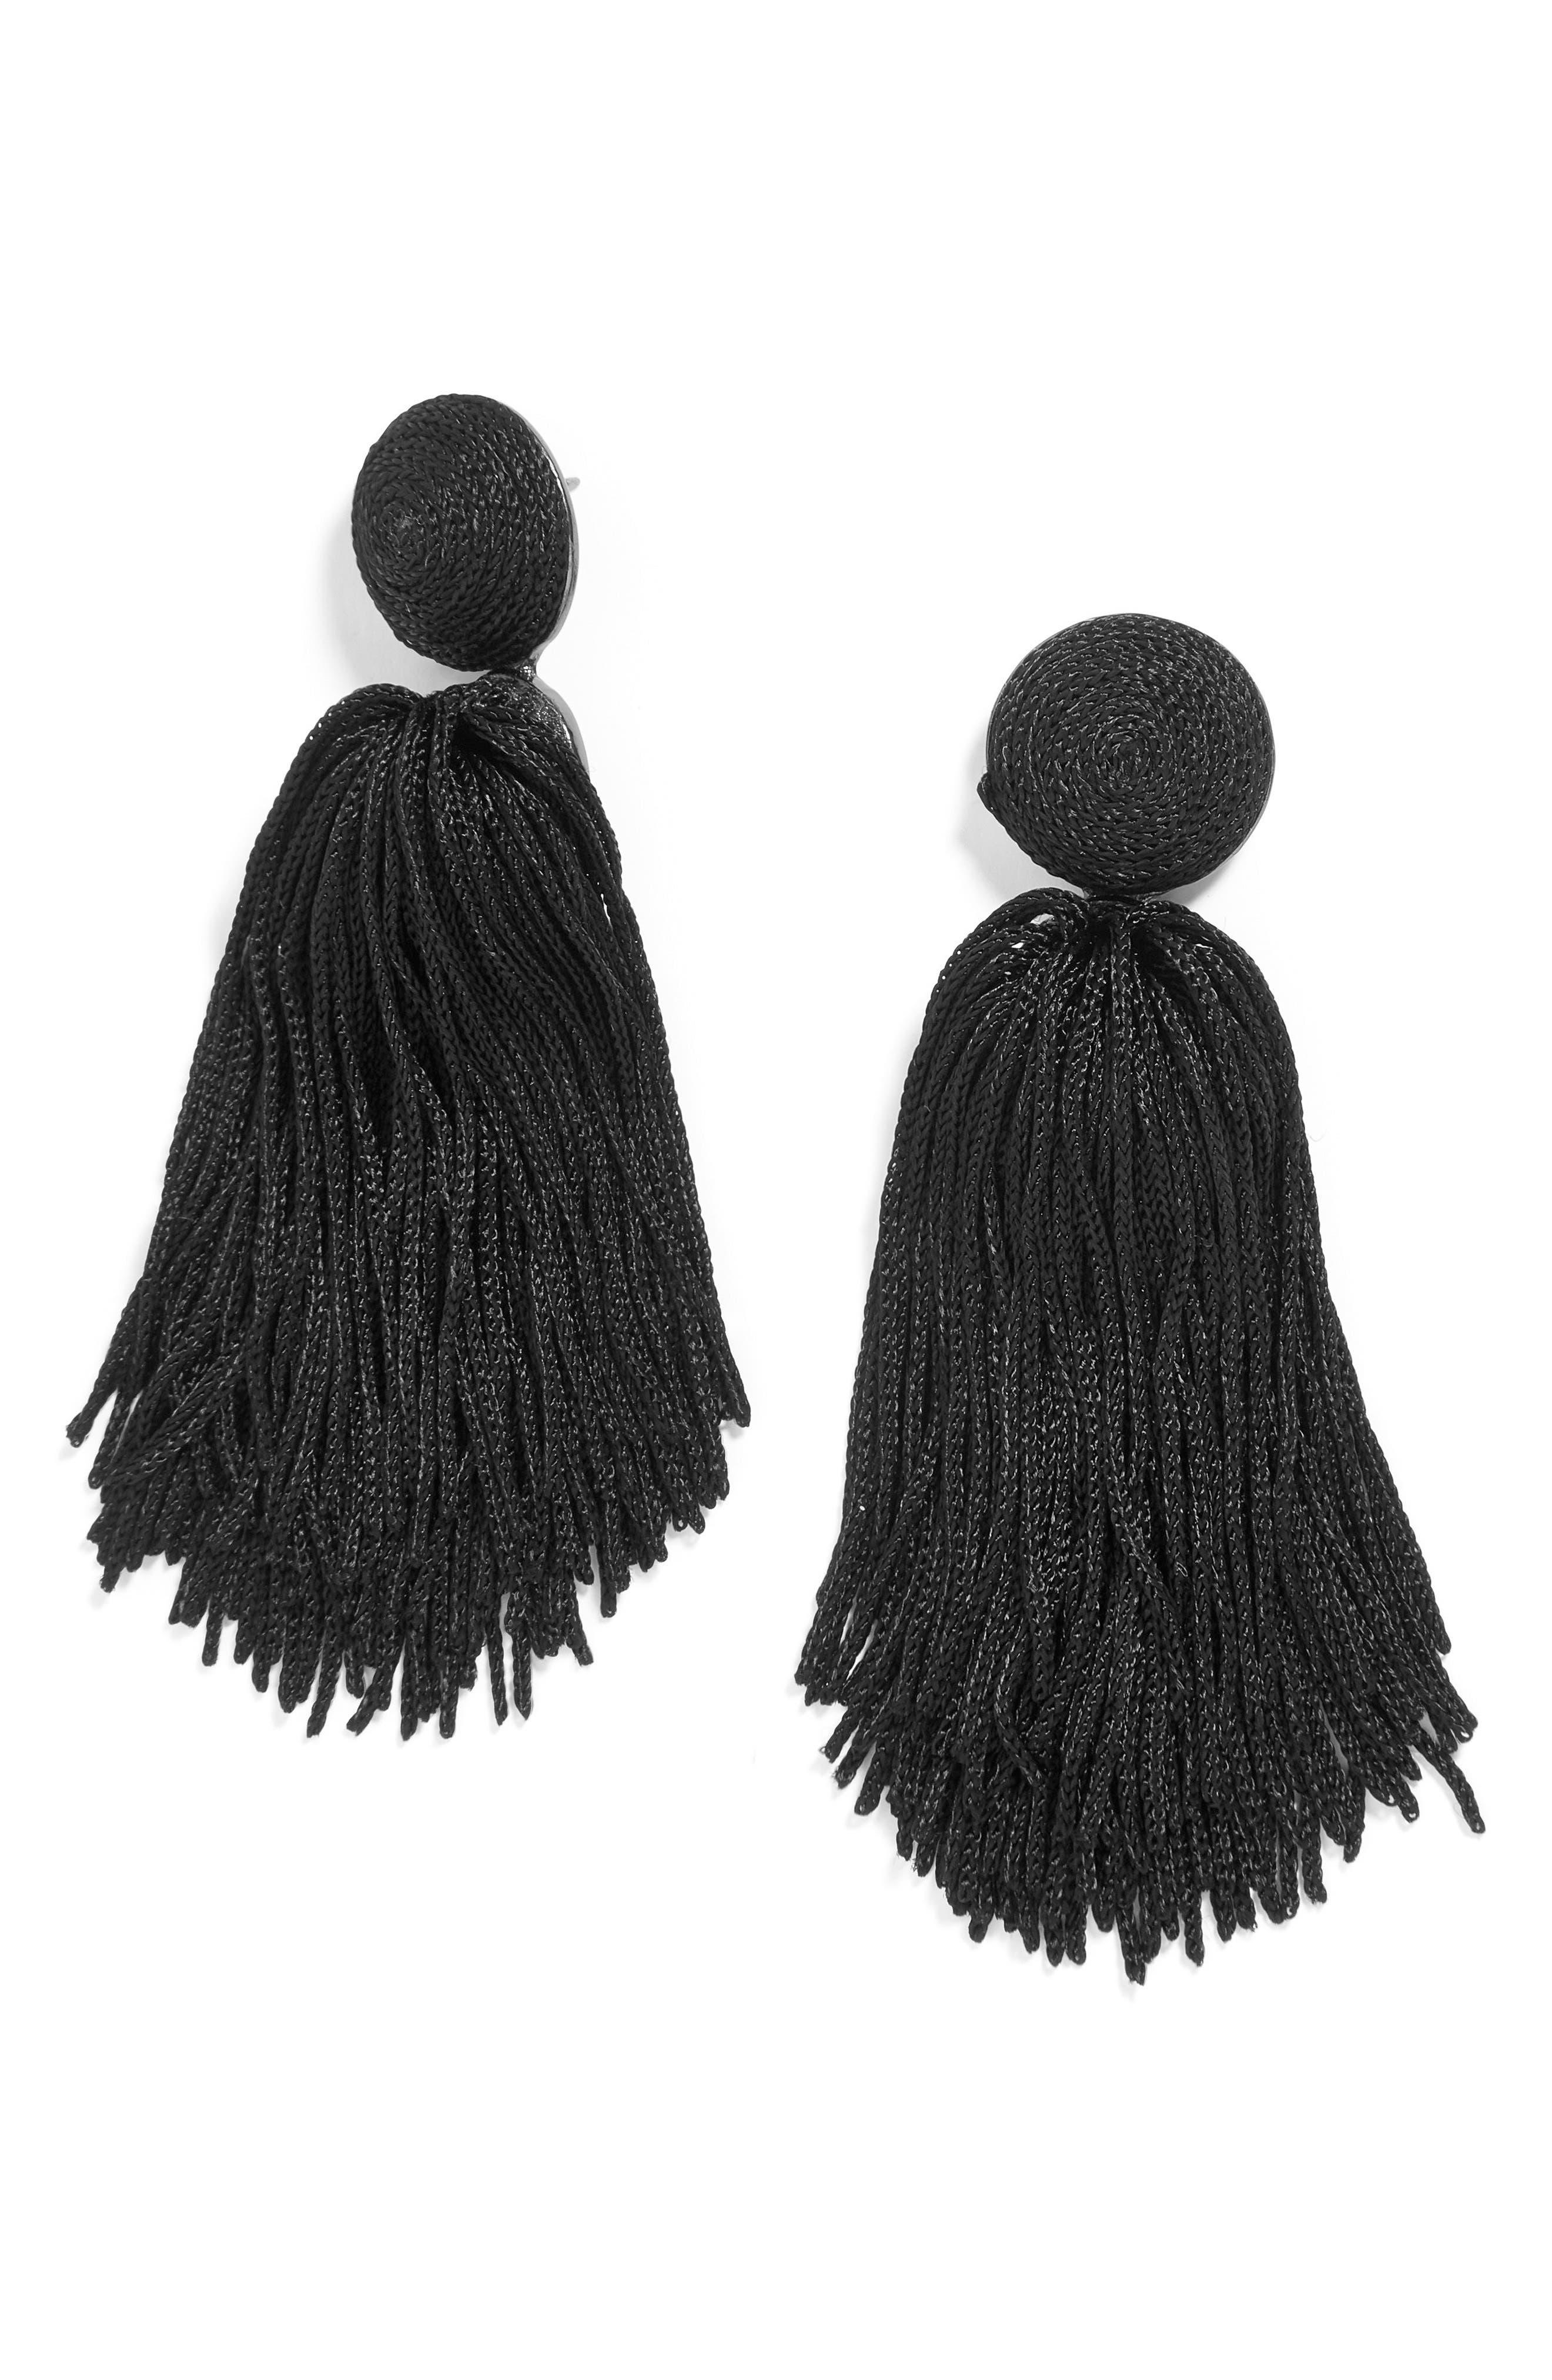 Sonatina Tassel Earrings,                         Main,                         color, Black